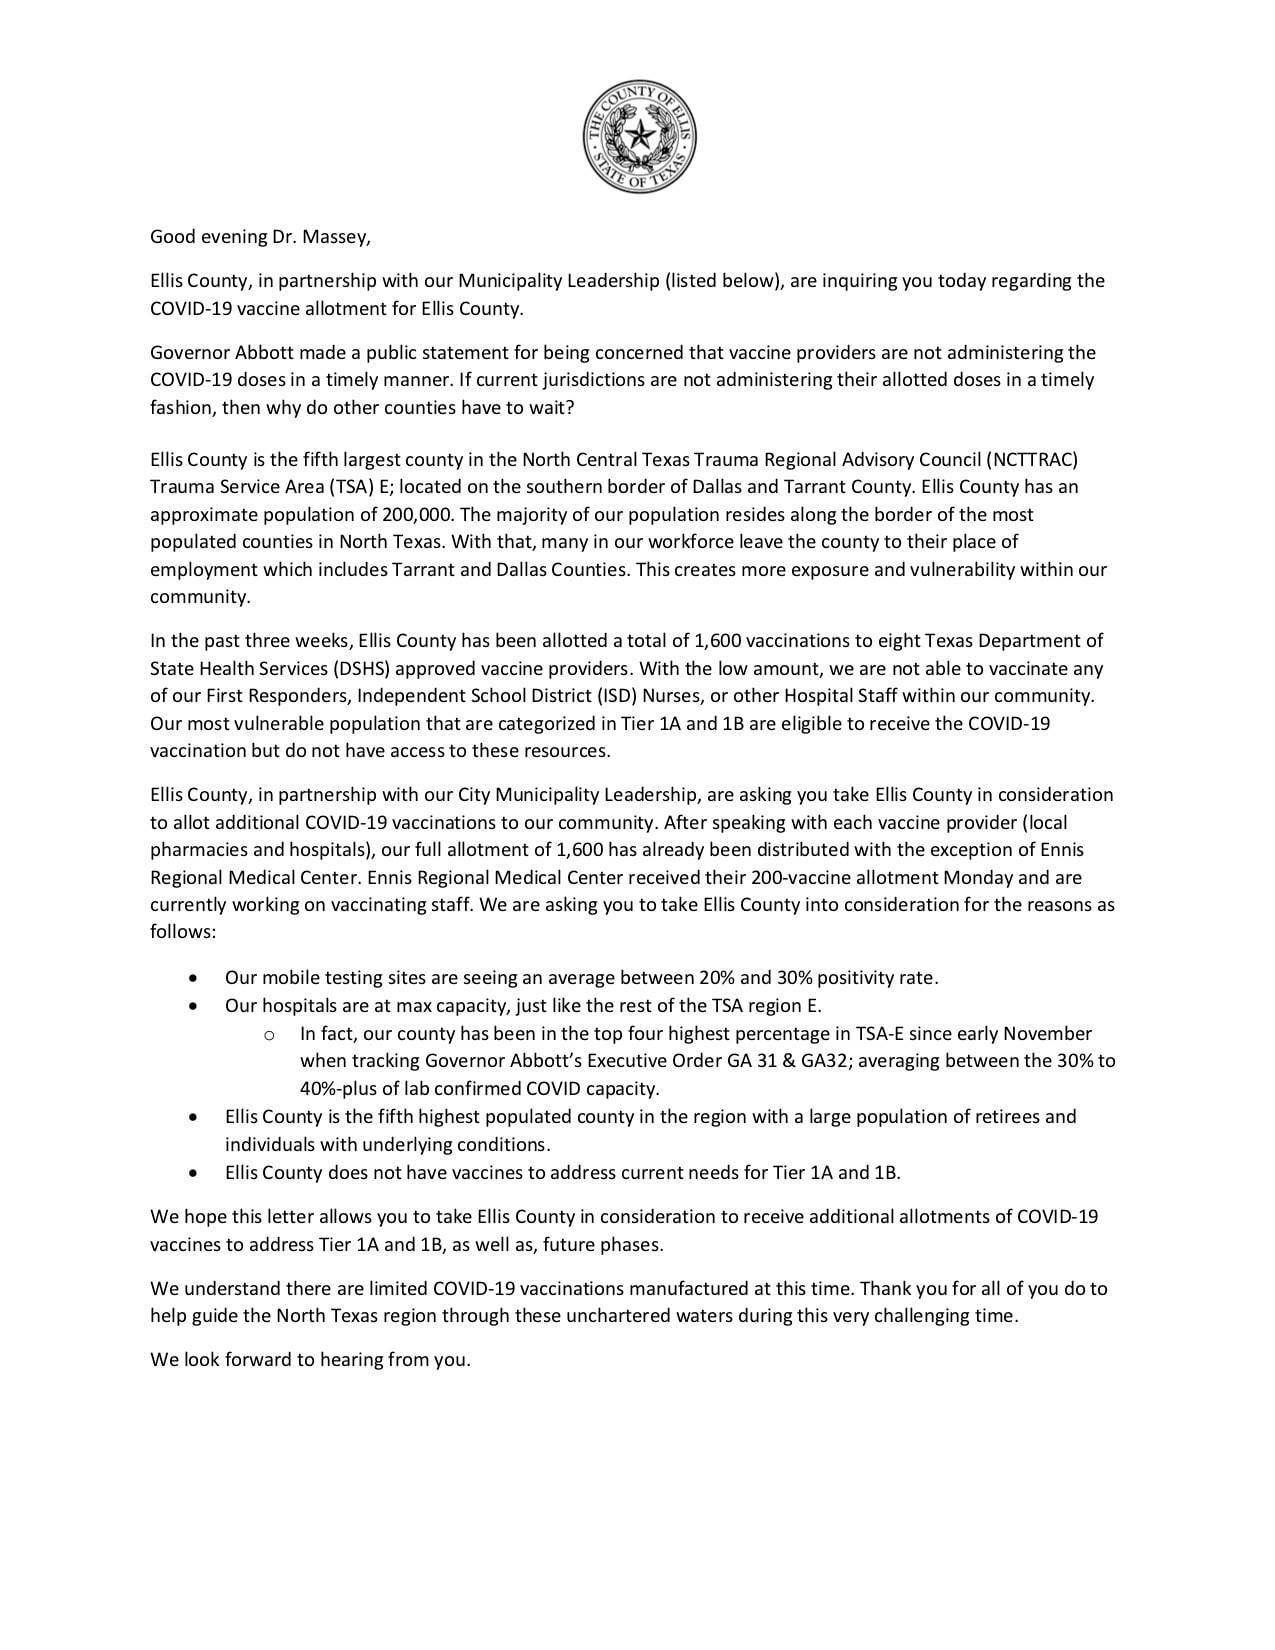 Ellis County letter vaccine